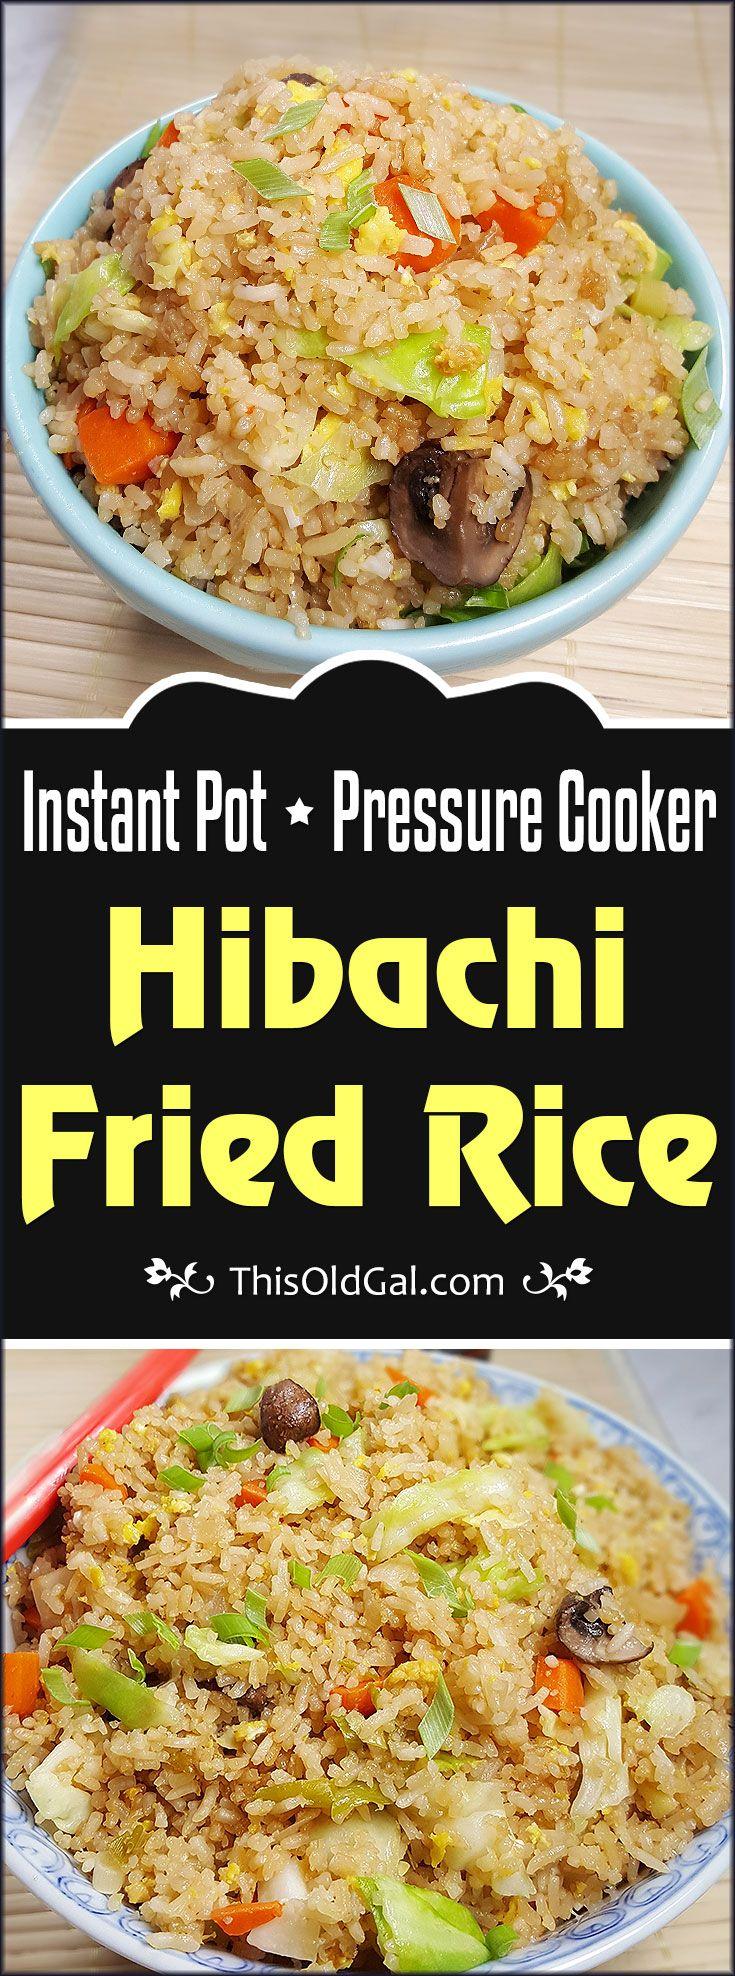 Instant Pot / Pressure Cooker Fried Rice Image